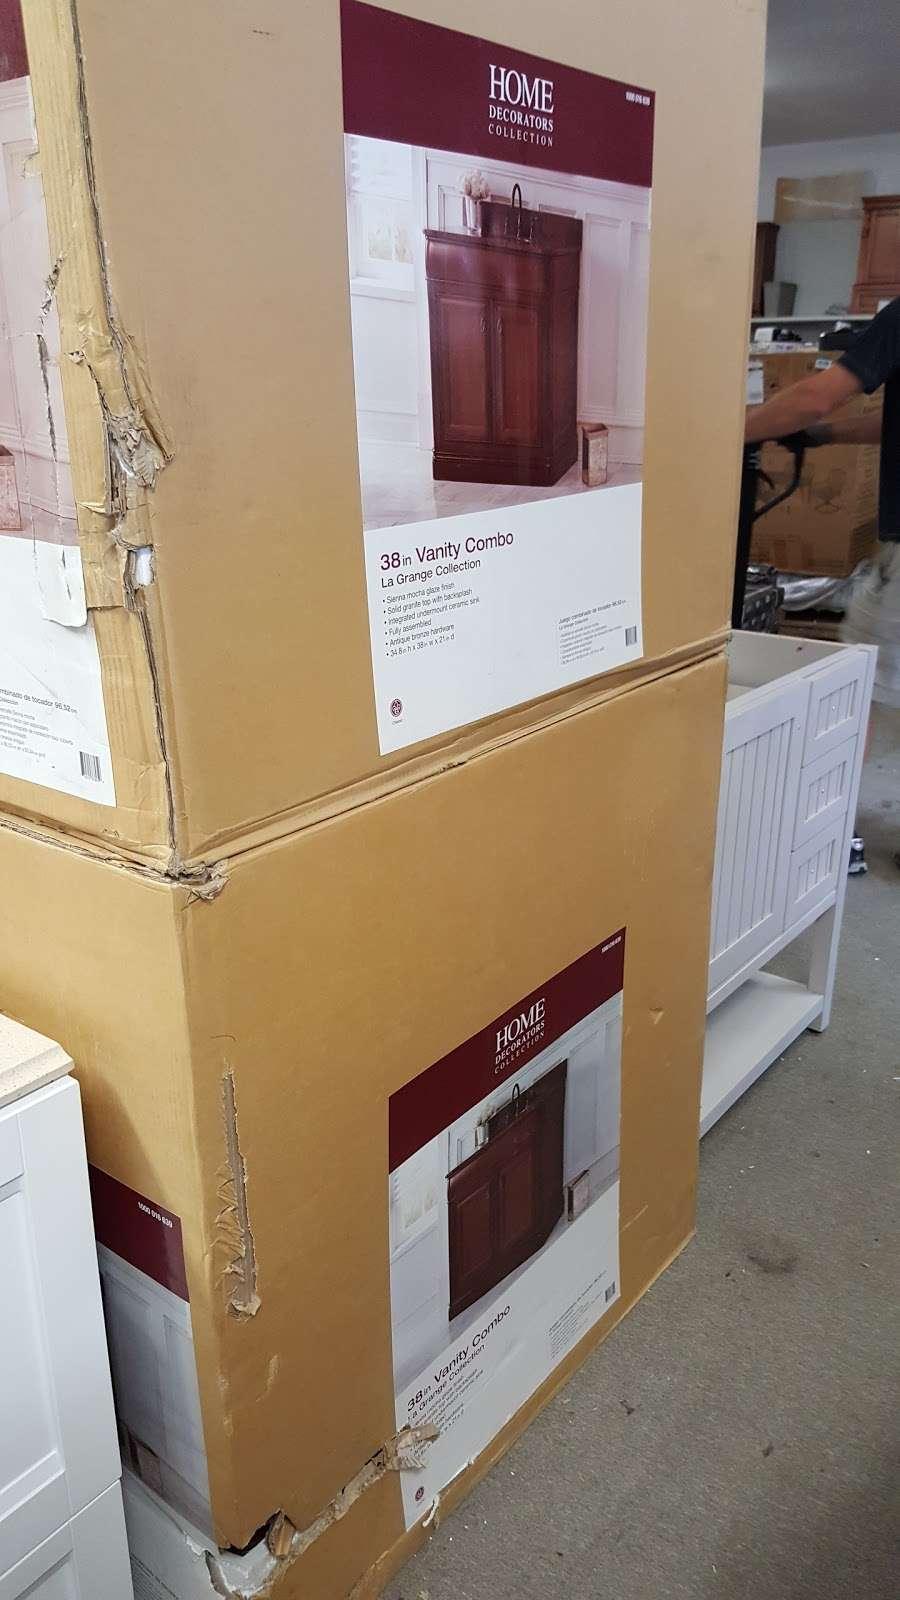 Half Price Hardware - hardware store  | Photo 5 of 10 | Address: 520 Main St, Delta, PA 17314, USA | Phone: (443) 528-8543